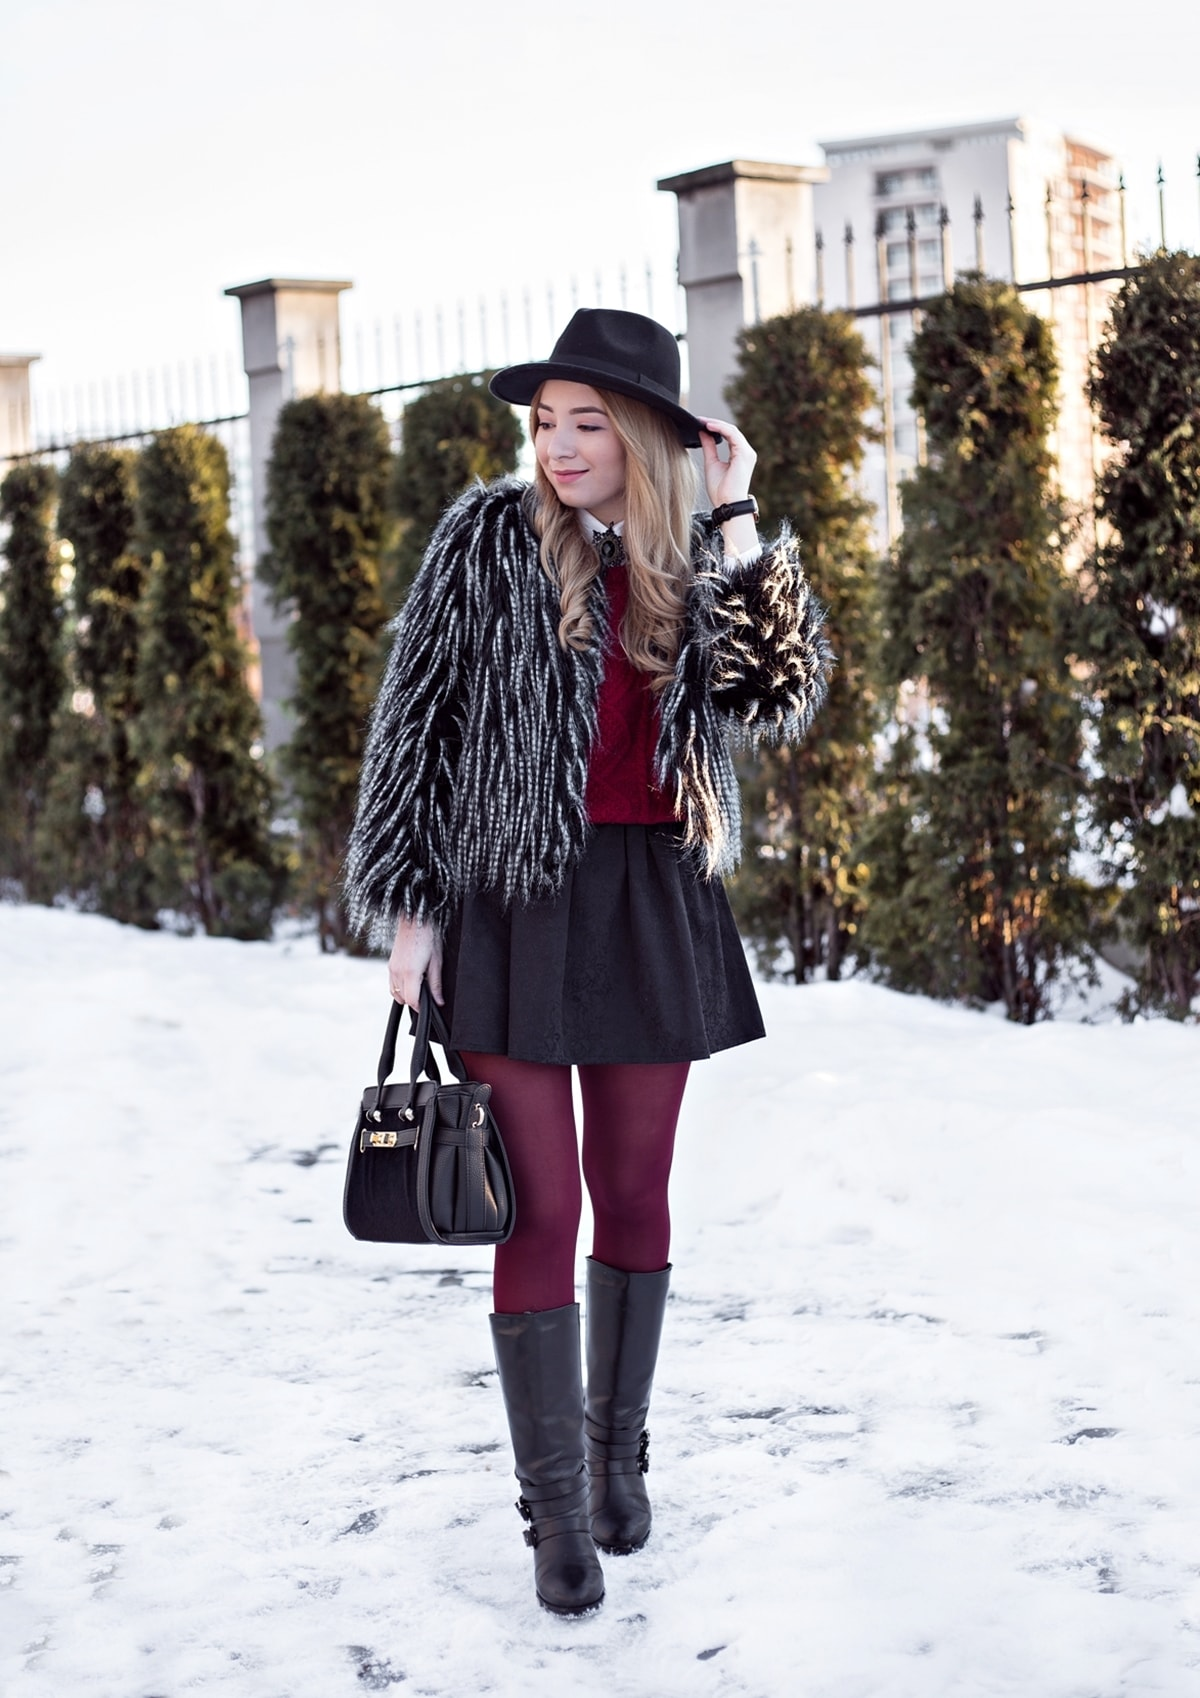 Andreea Ristea, fusta din brocard negru, incretita, combinatia de alb, negru si burgundy, tinuta de iarna chic cu palarie, brosa purtata la camasa, blogger moda Pitesti